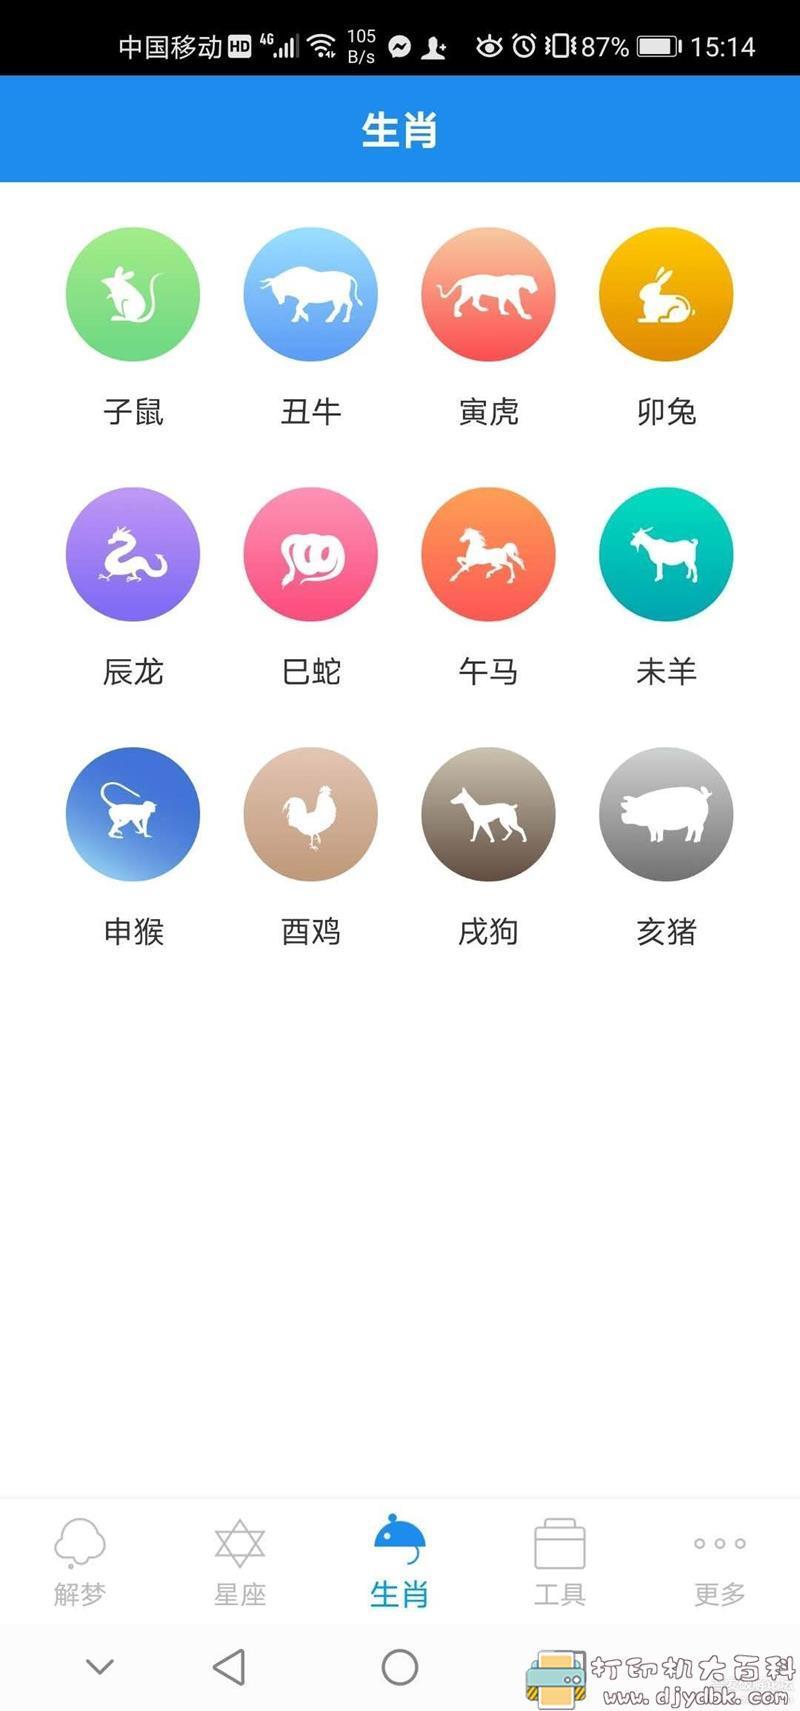 [Android]【周公解梦app】解梦预测图片 No.6